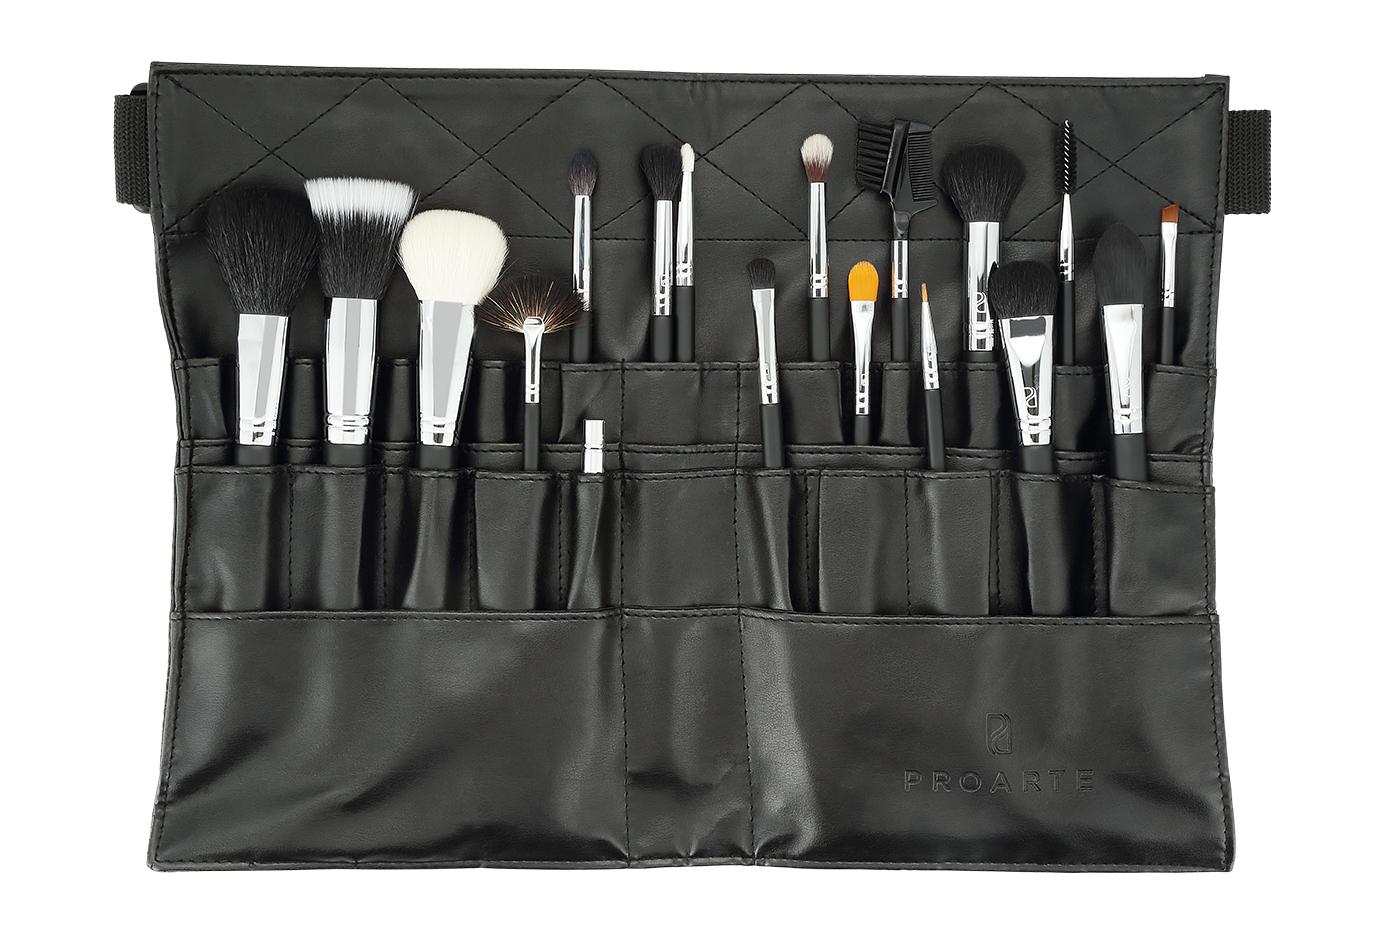 Proarte's Make-up Brush Set for artists